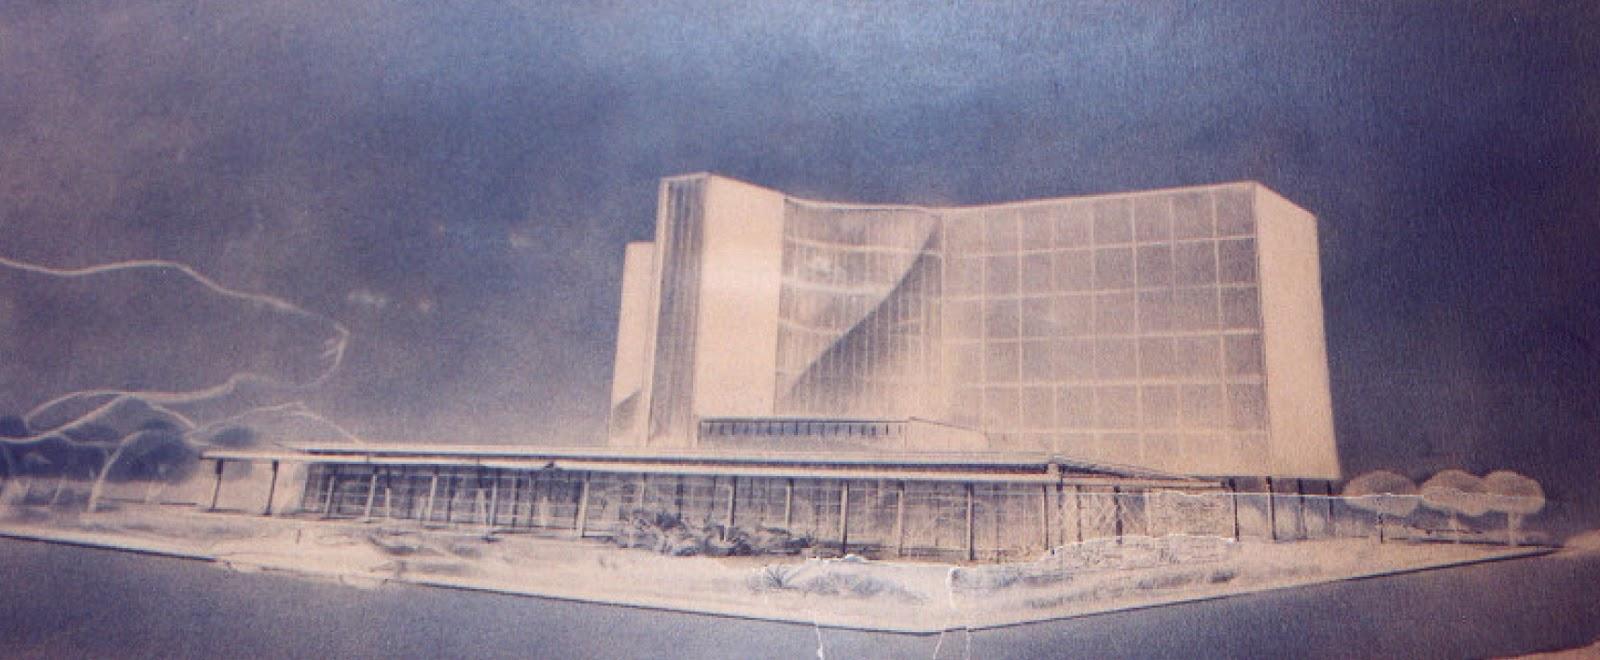 Anteprojeto do Grande Hotel Maringá - 1950